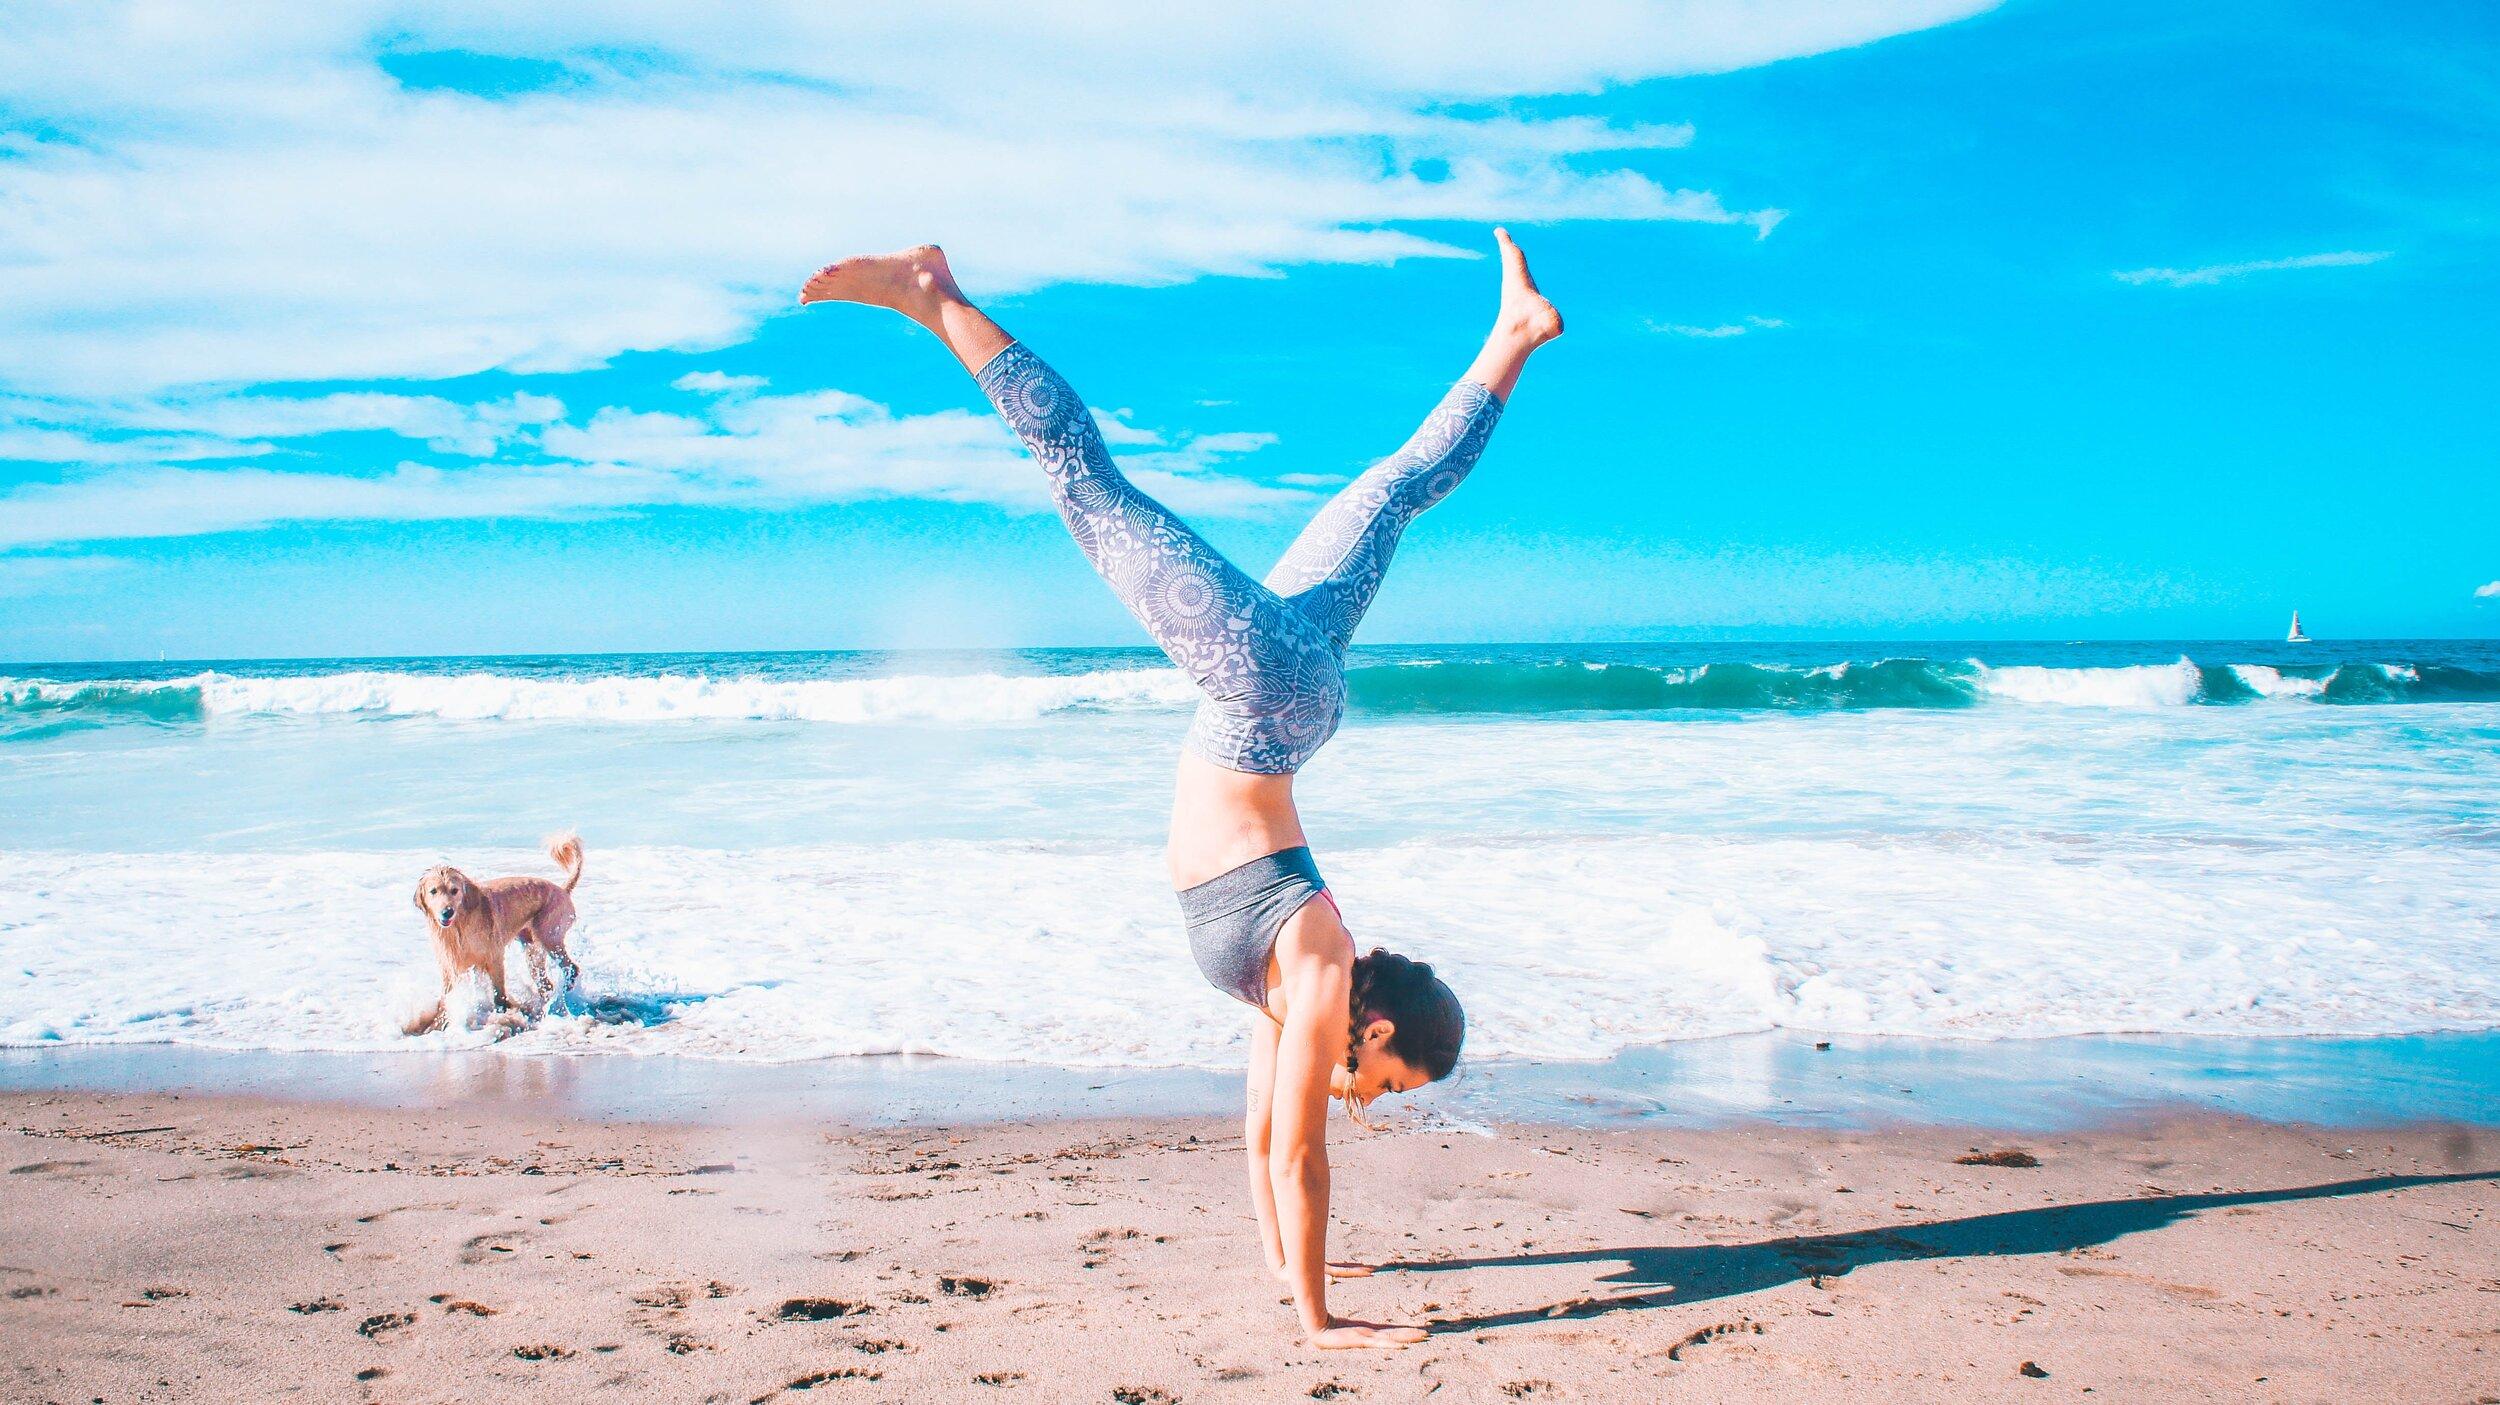 woman handstand on beach.jpg